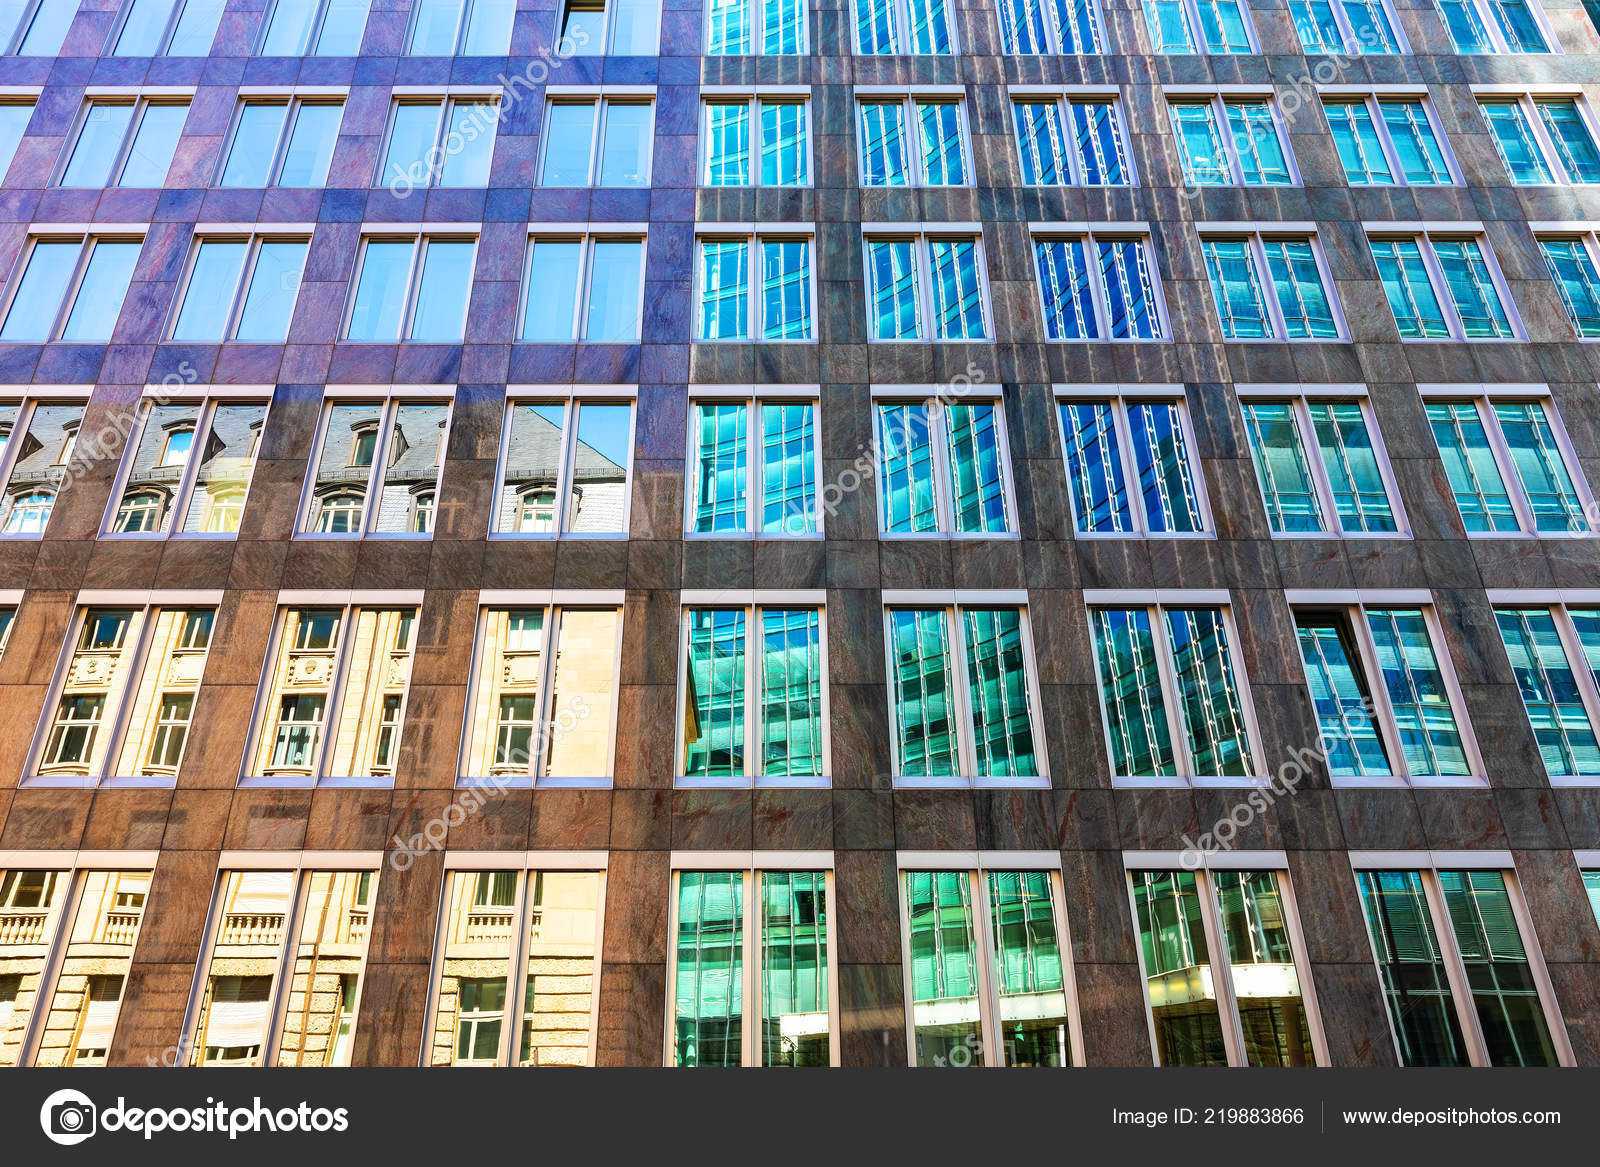 Creatieve abstracte architecturale stijl contrast achtergrond oud